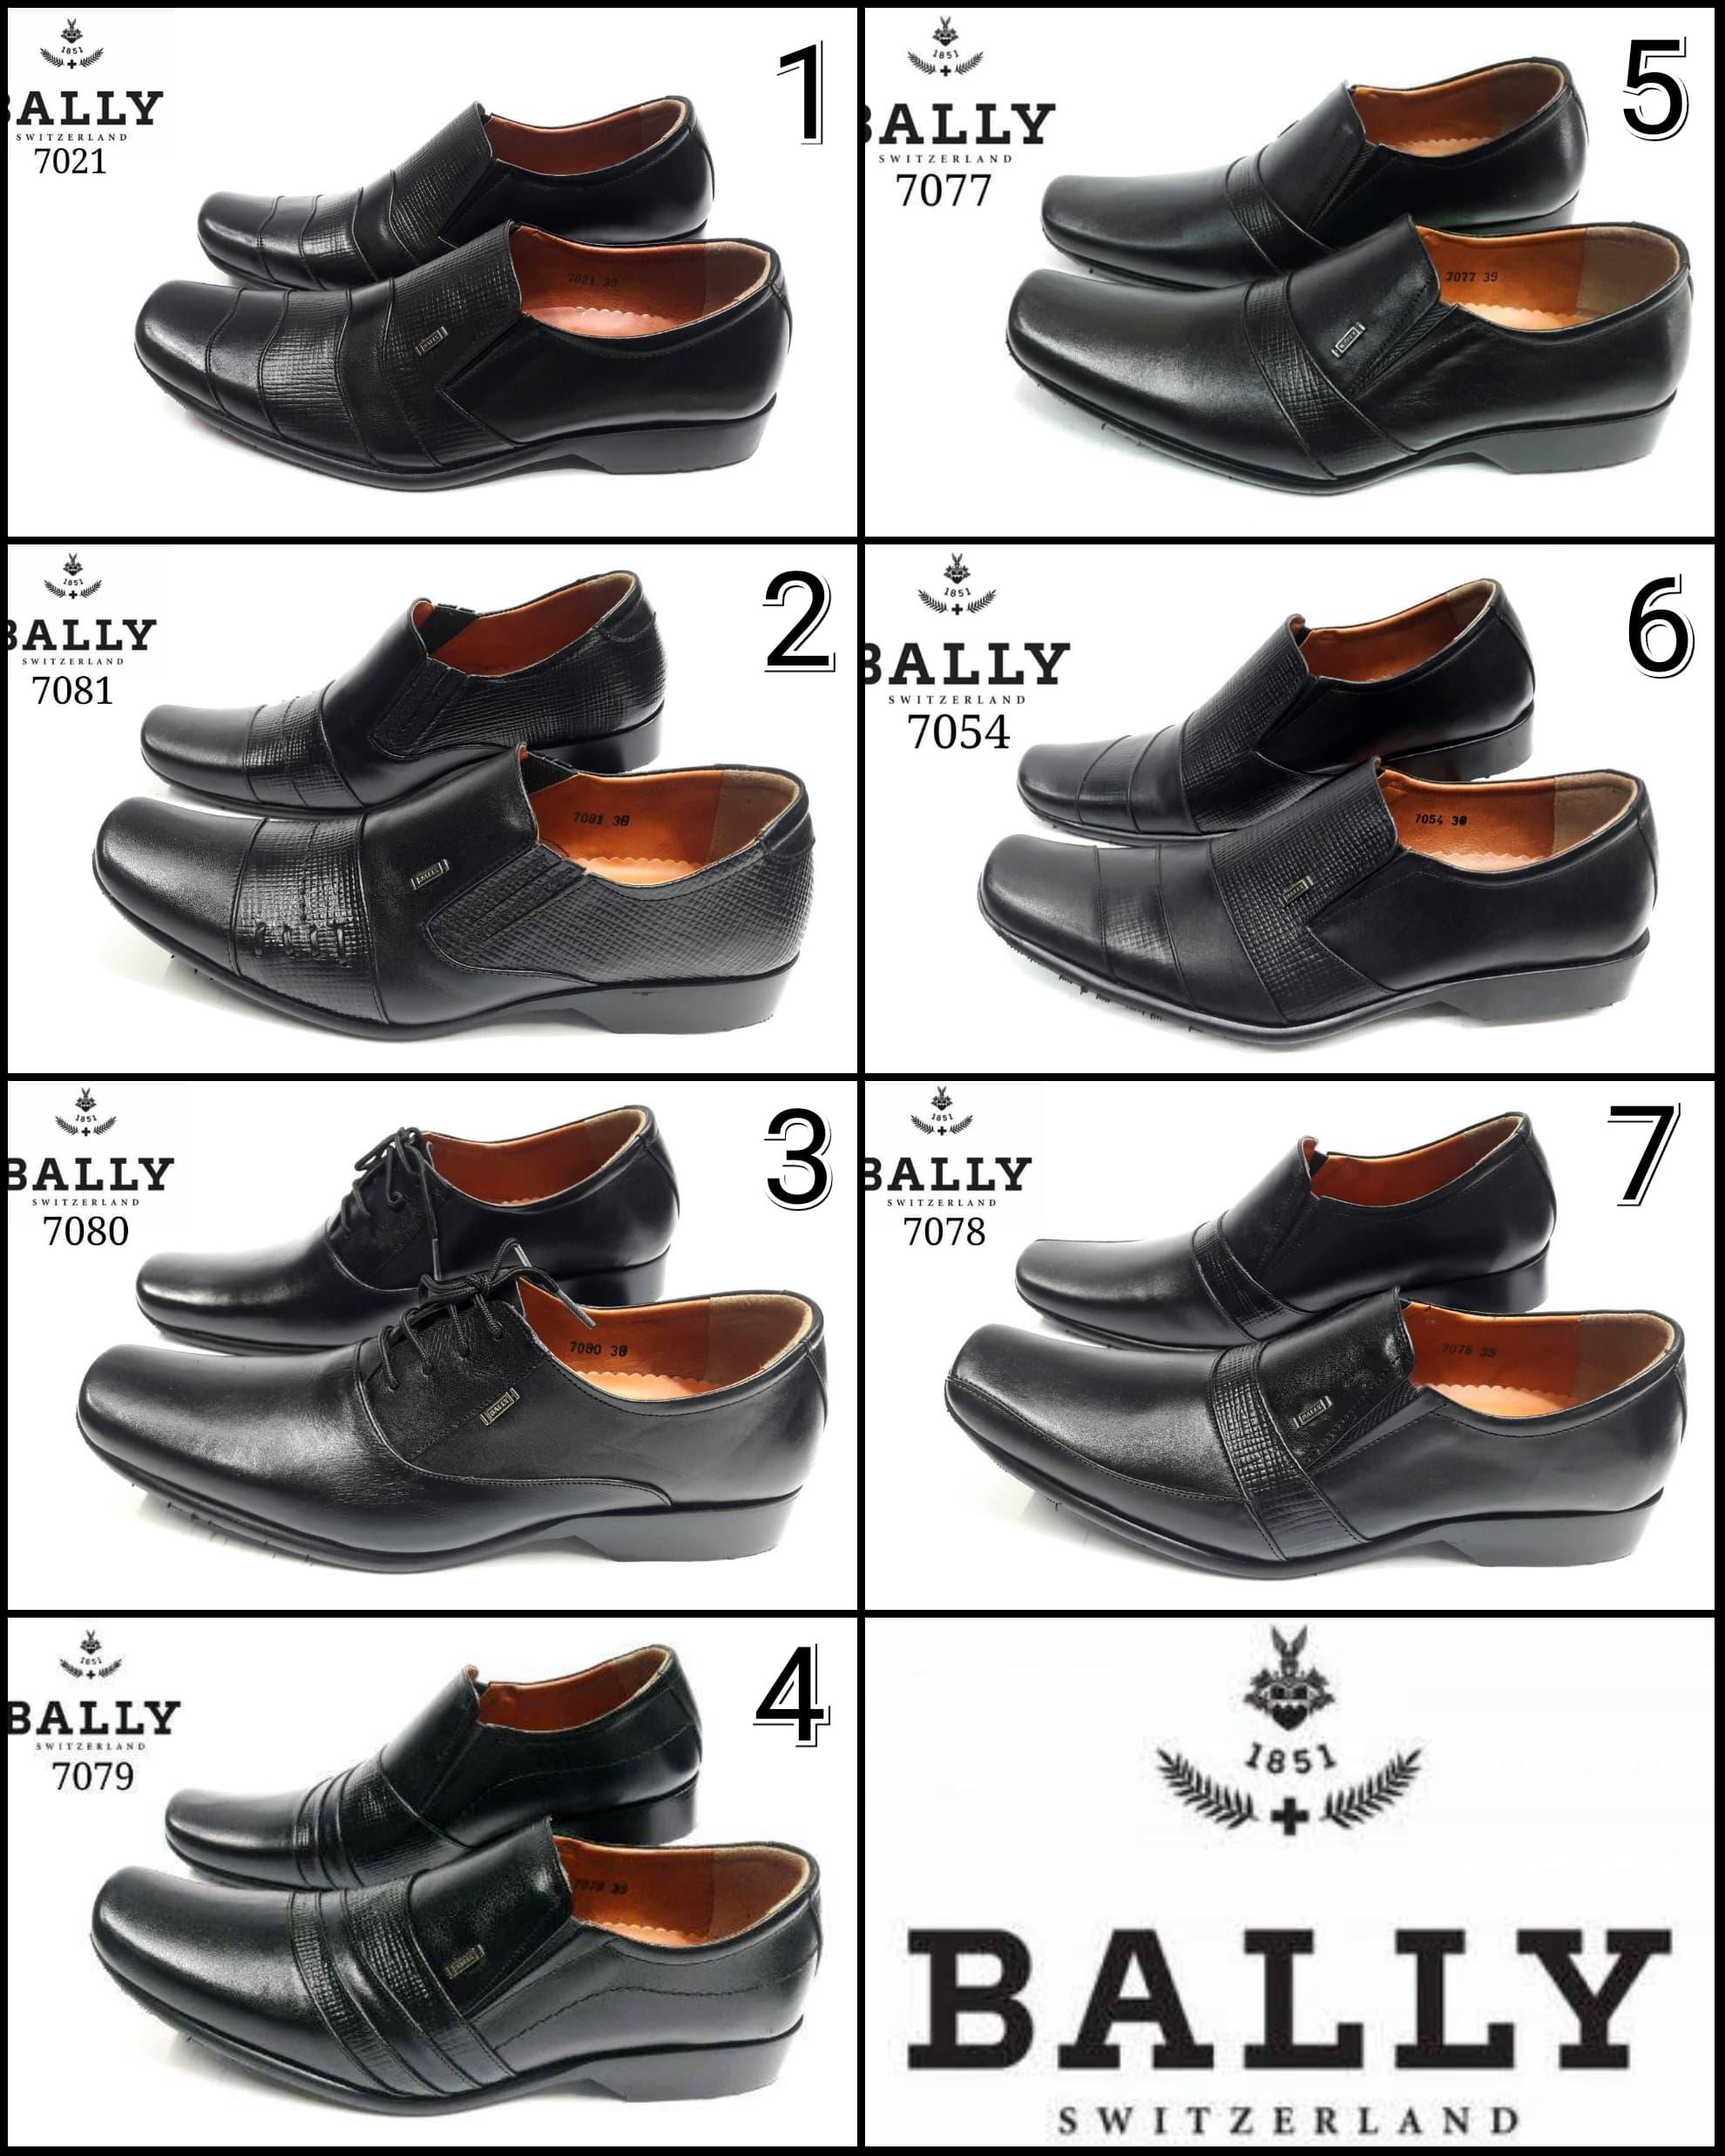 PENAWARAN Sepatu Bally Mix 1 Pantofel Pria Kulit Asli Formal Kerja Kantor 970597edde